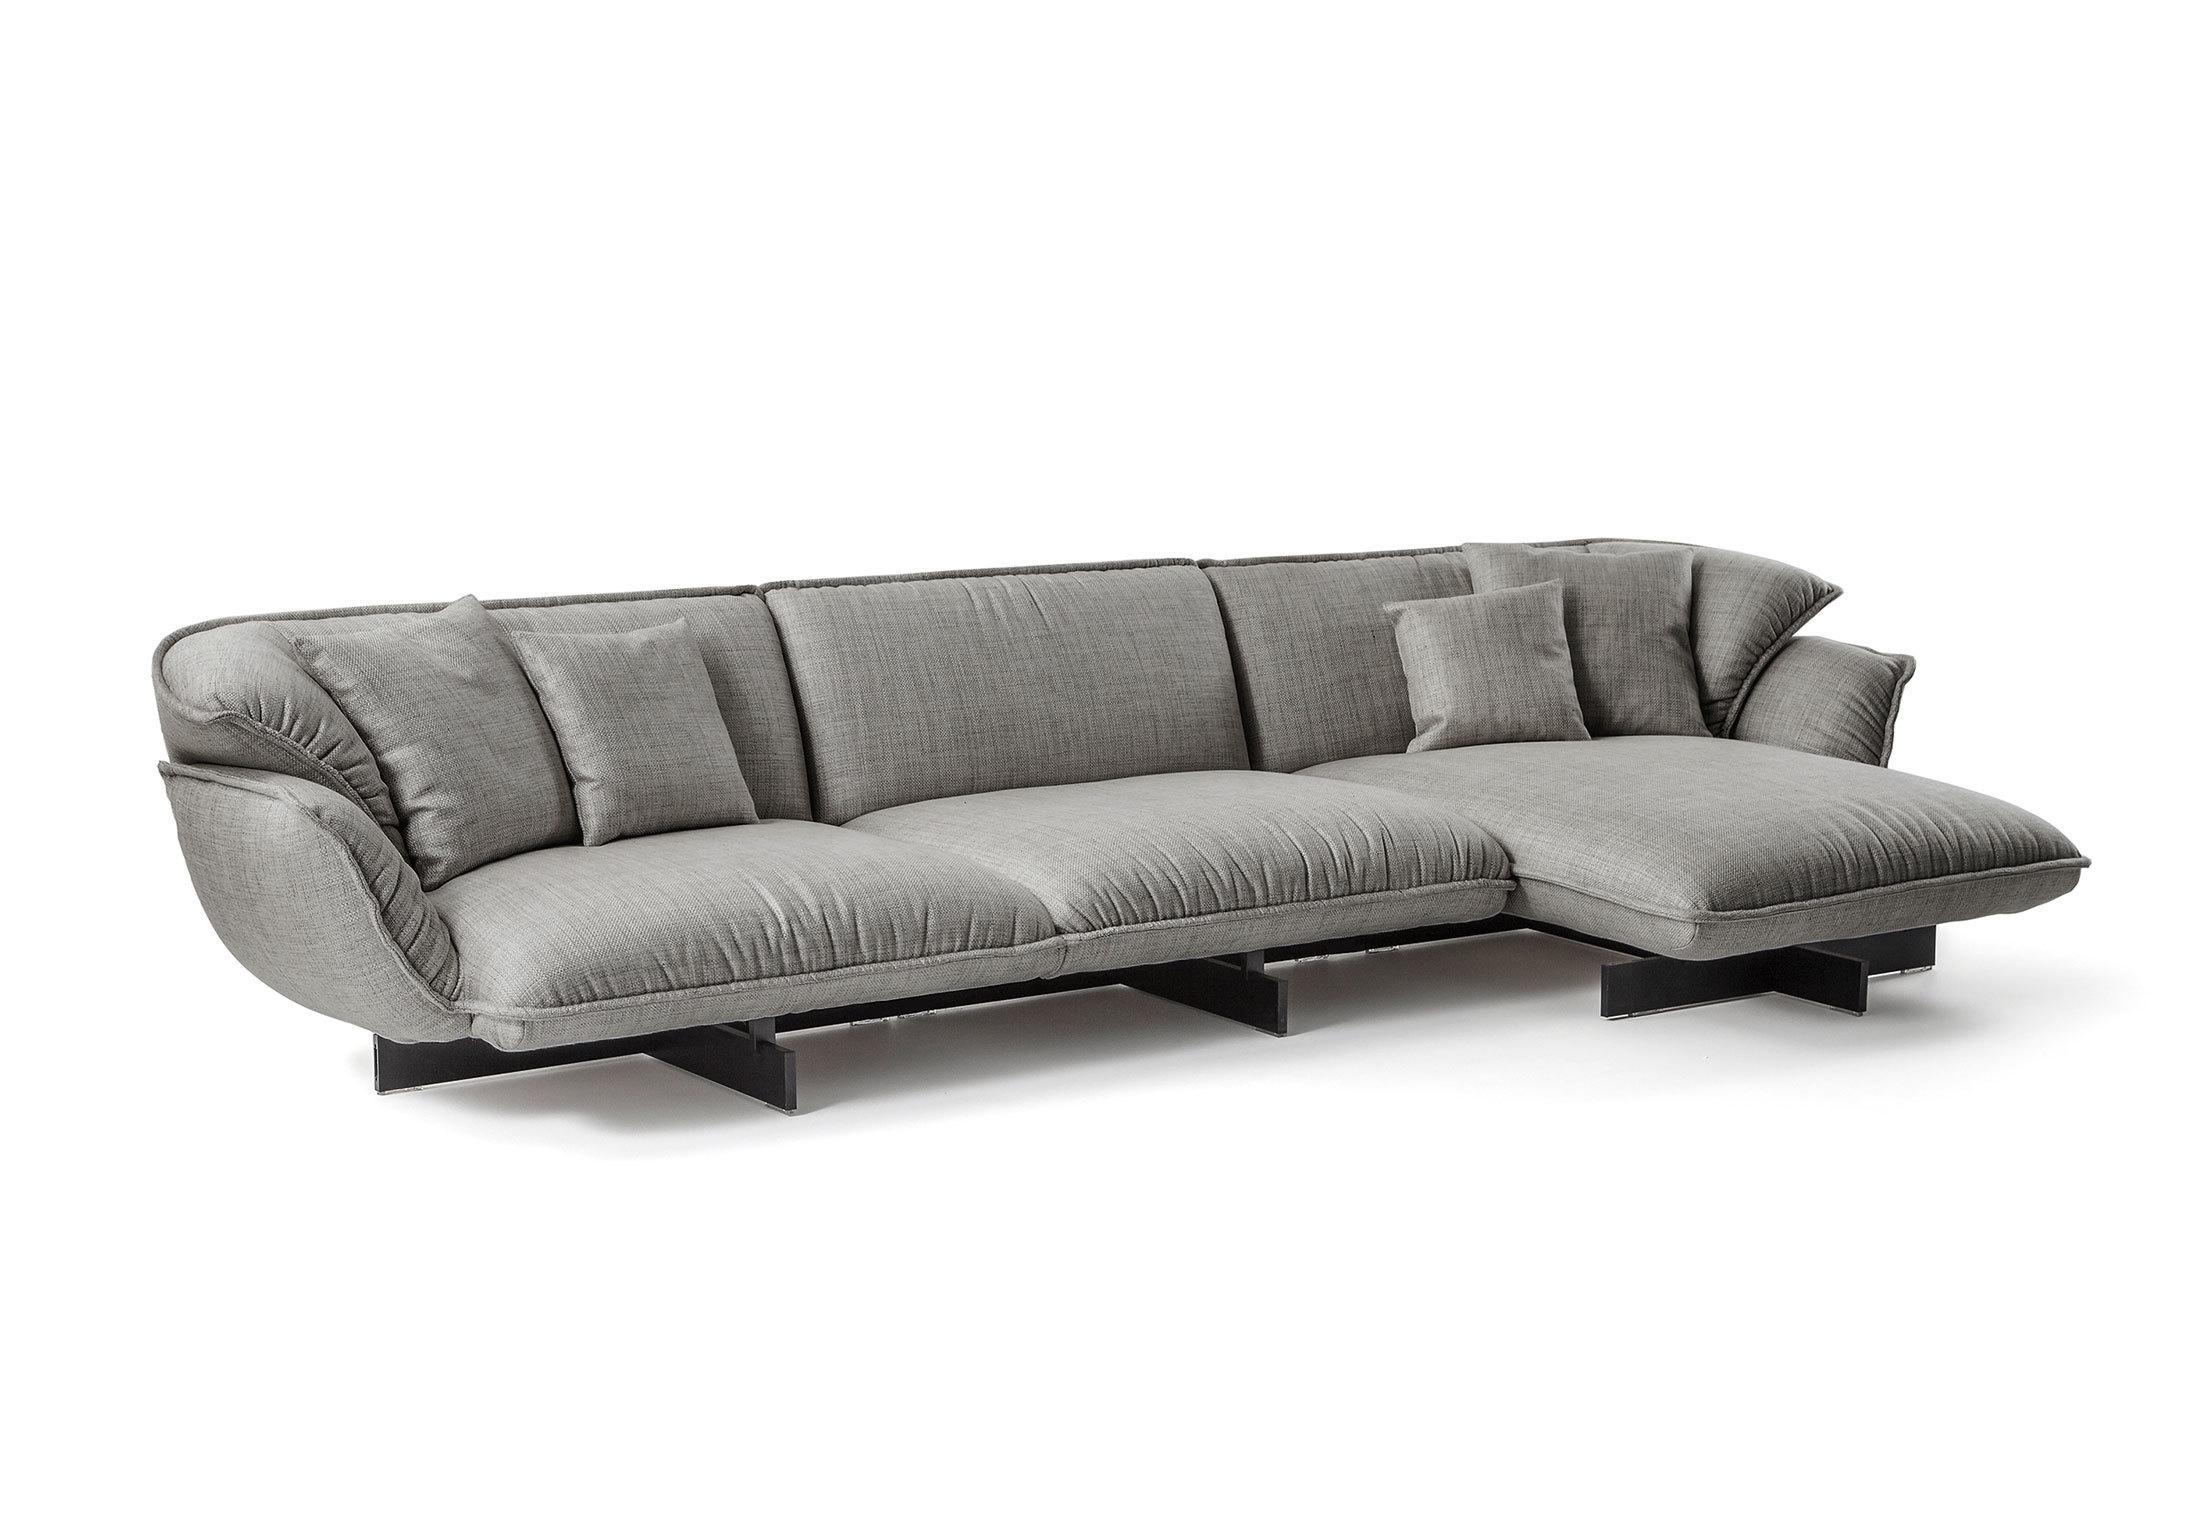 super beam sofa von cassina stylepark. Black Bedroom Furniture Sets. Home Design Ideas